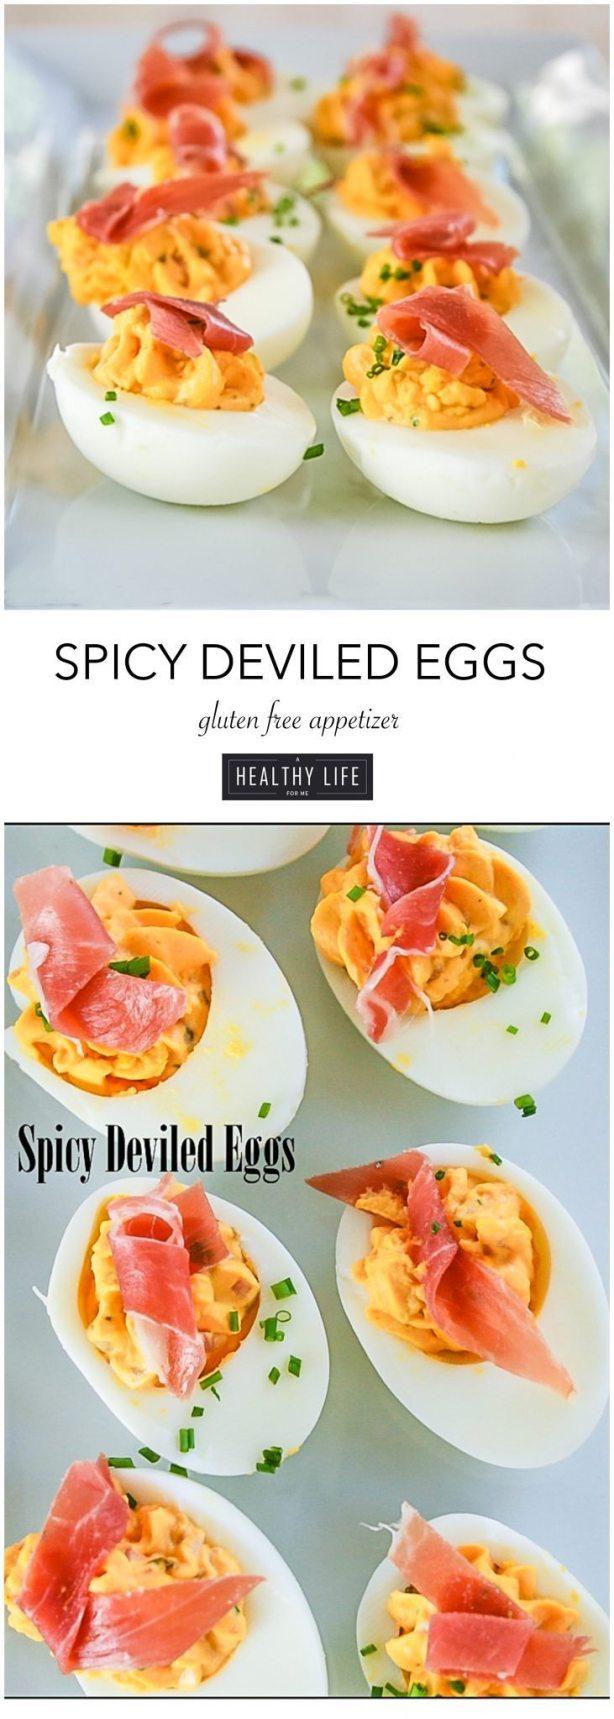 spicy deviled egg recipe | ahealthylifeforme.com